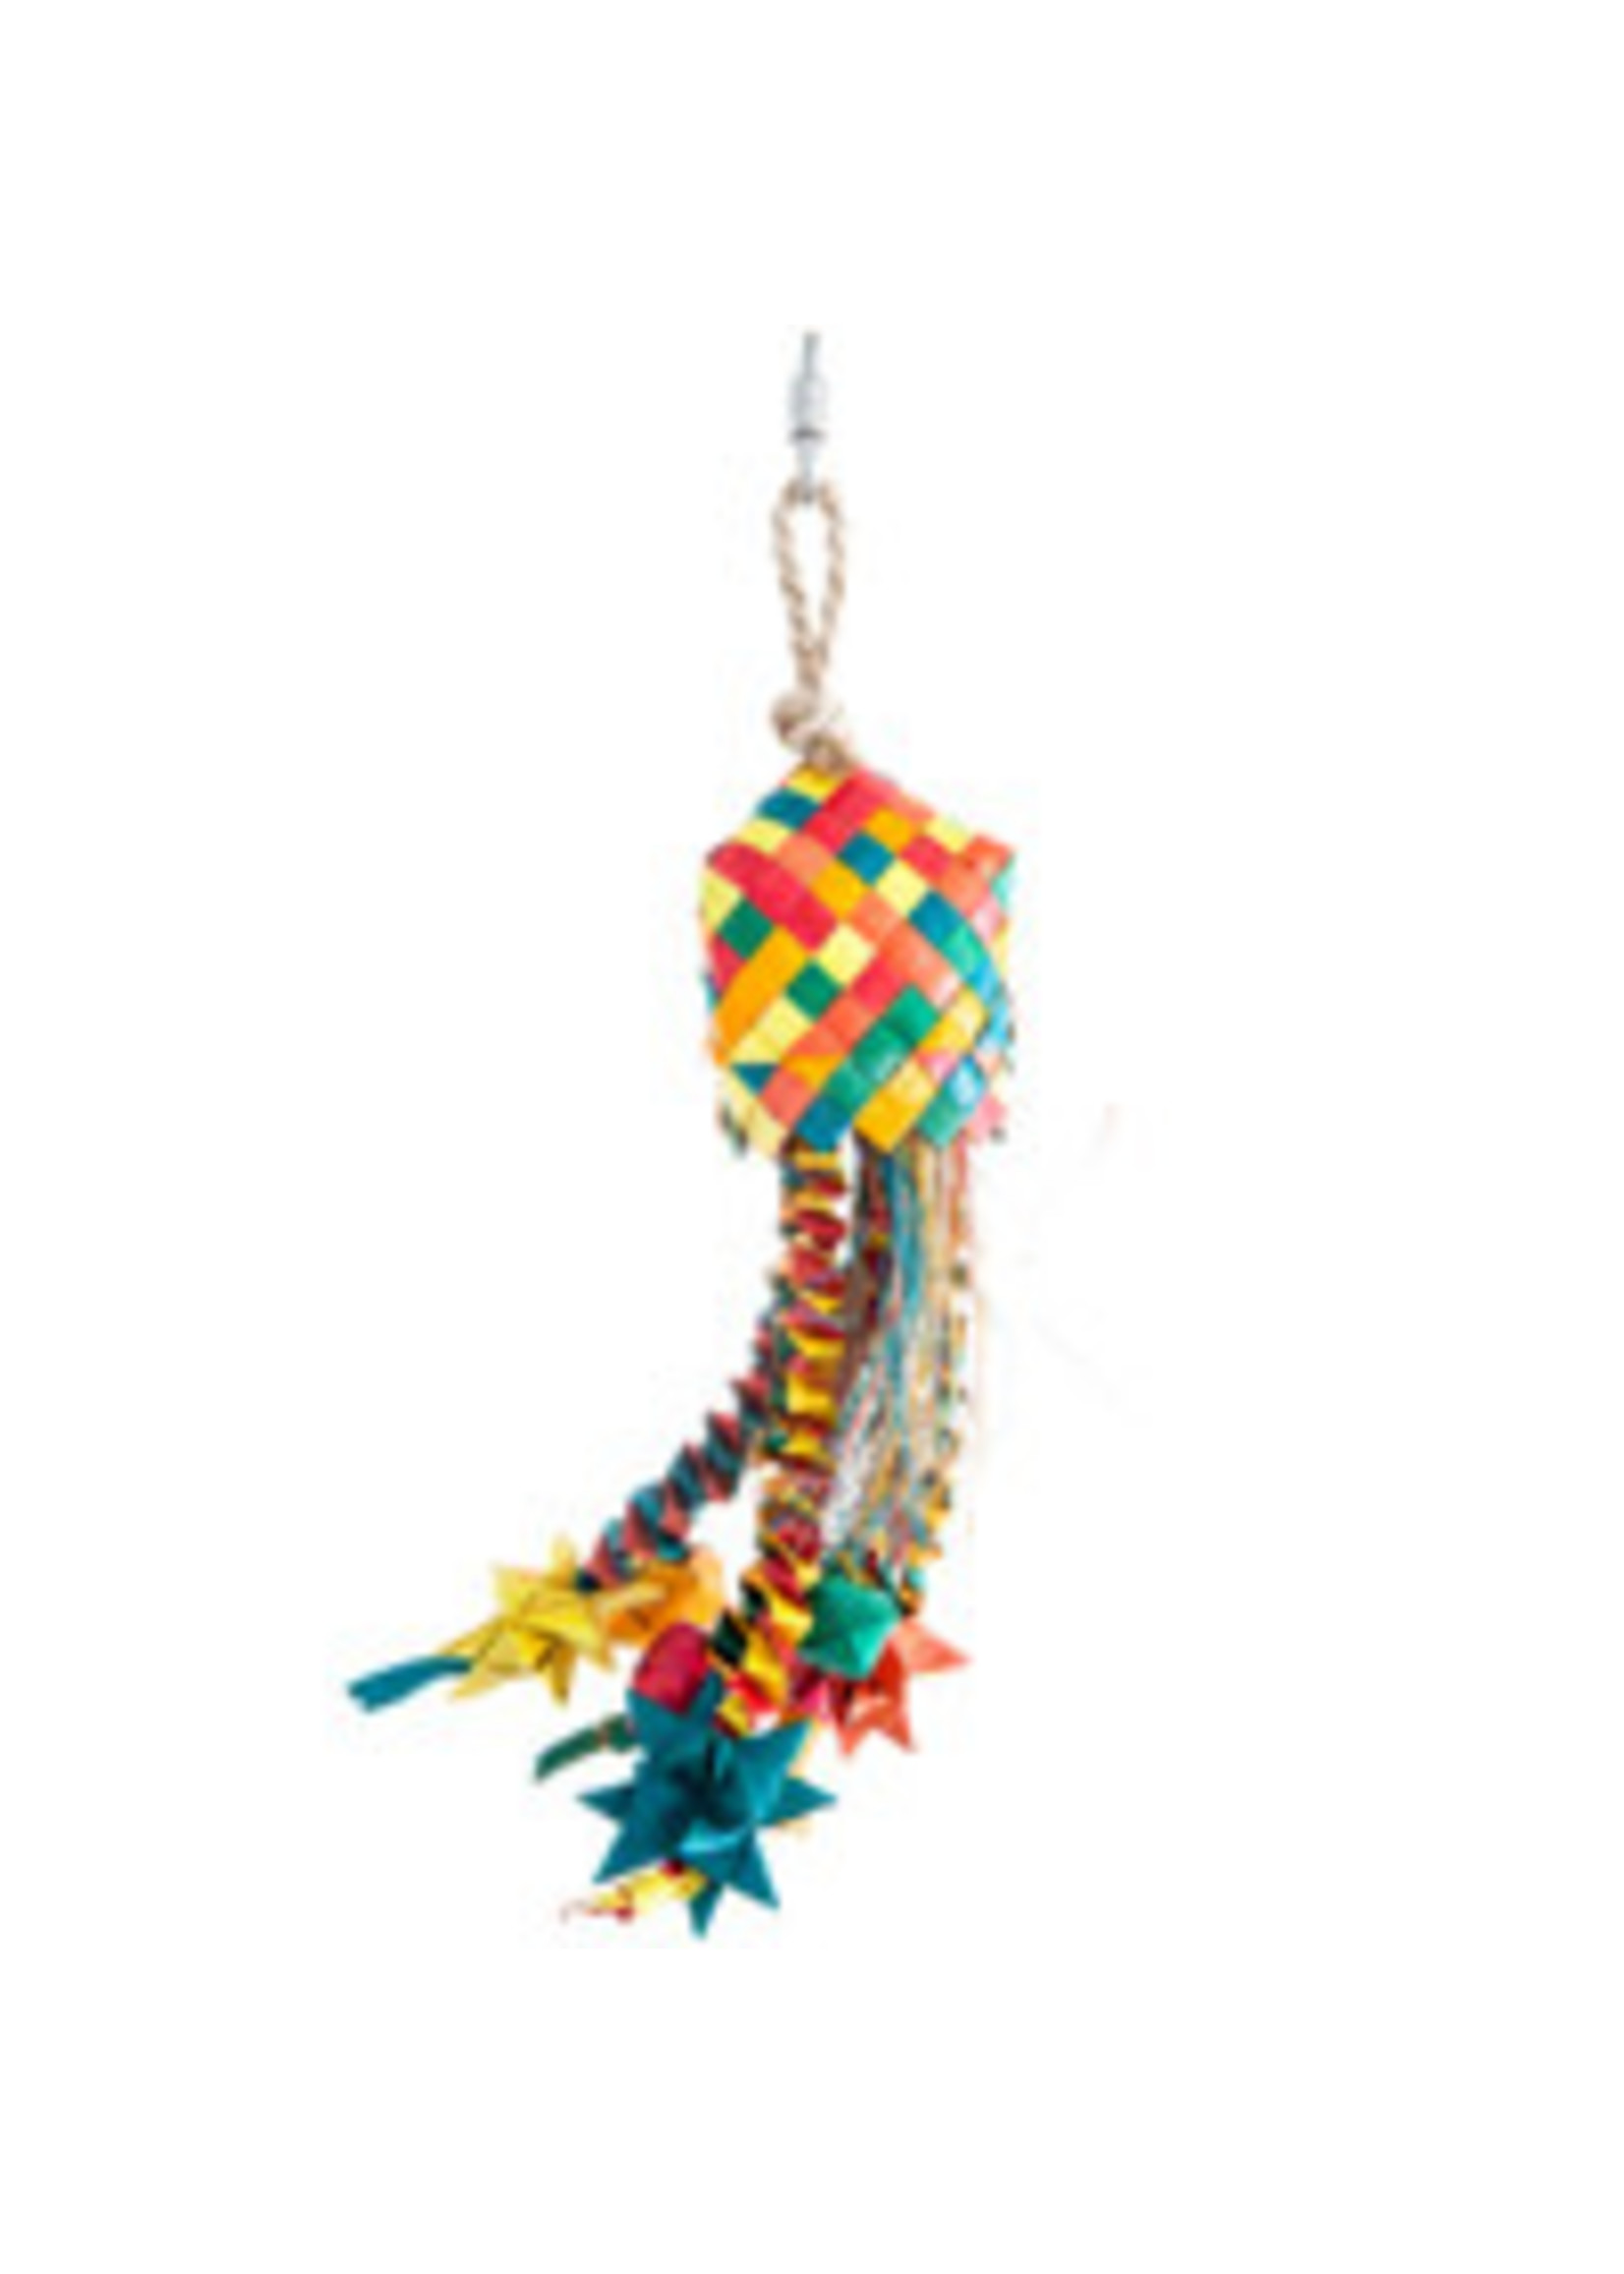 Hagen Hagen HARI Rustic Treasures Bird Toy Star Basket - Large 81209